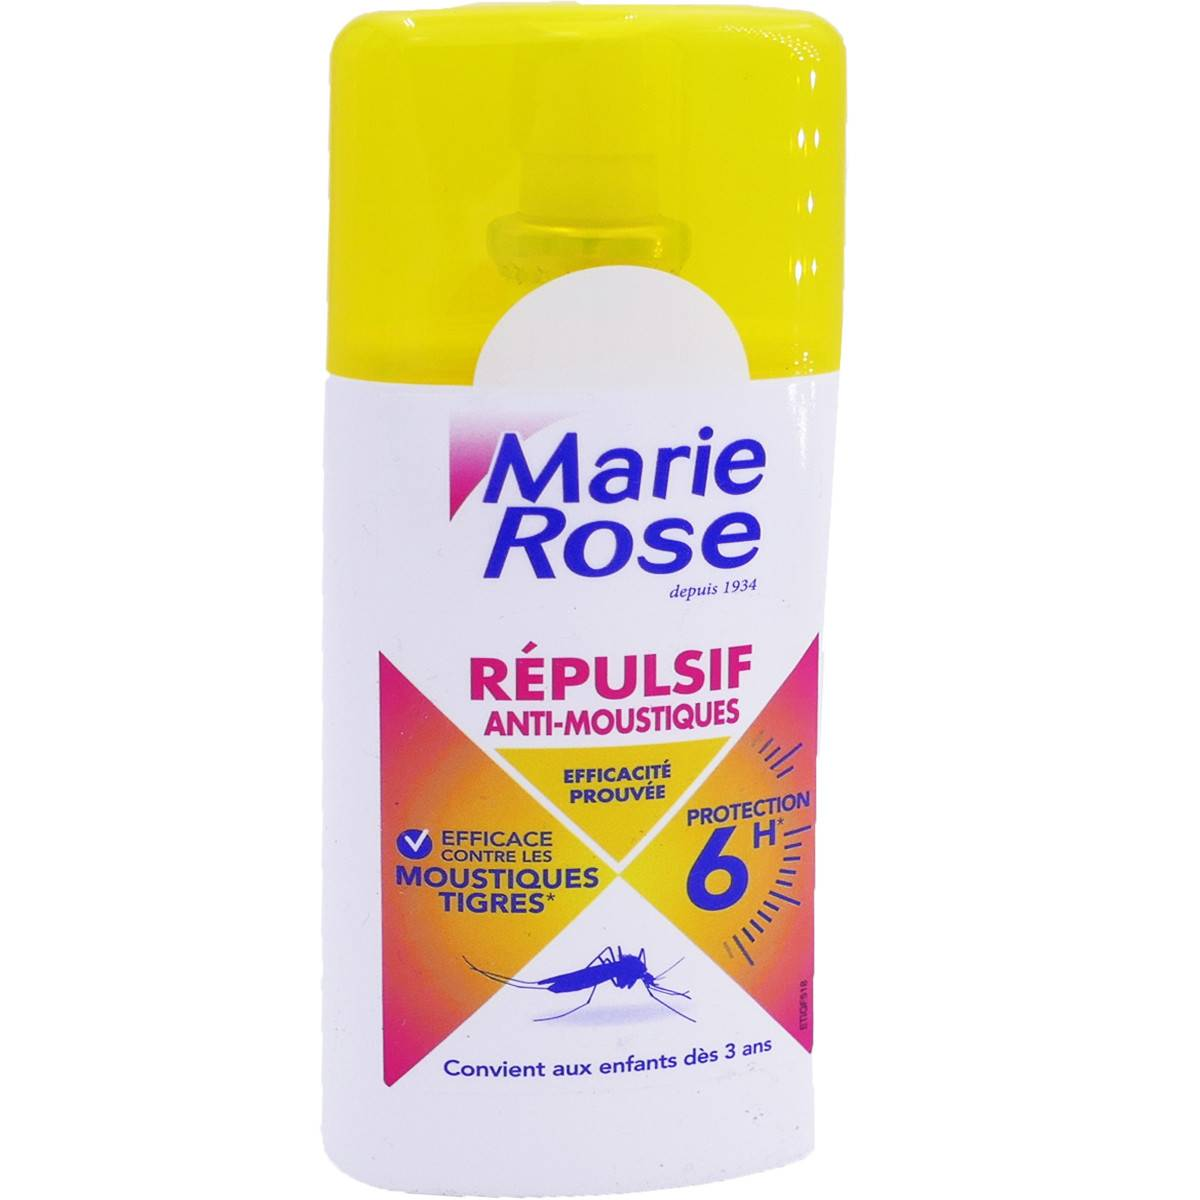 JUVASANTE Marie rose repulsif anti-moustiques  100 ml